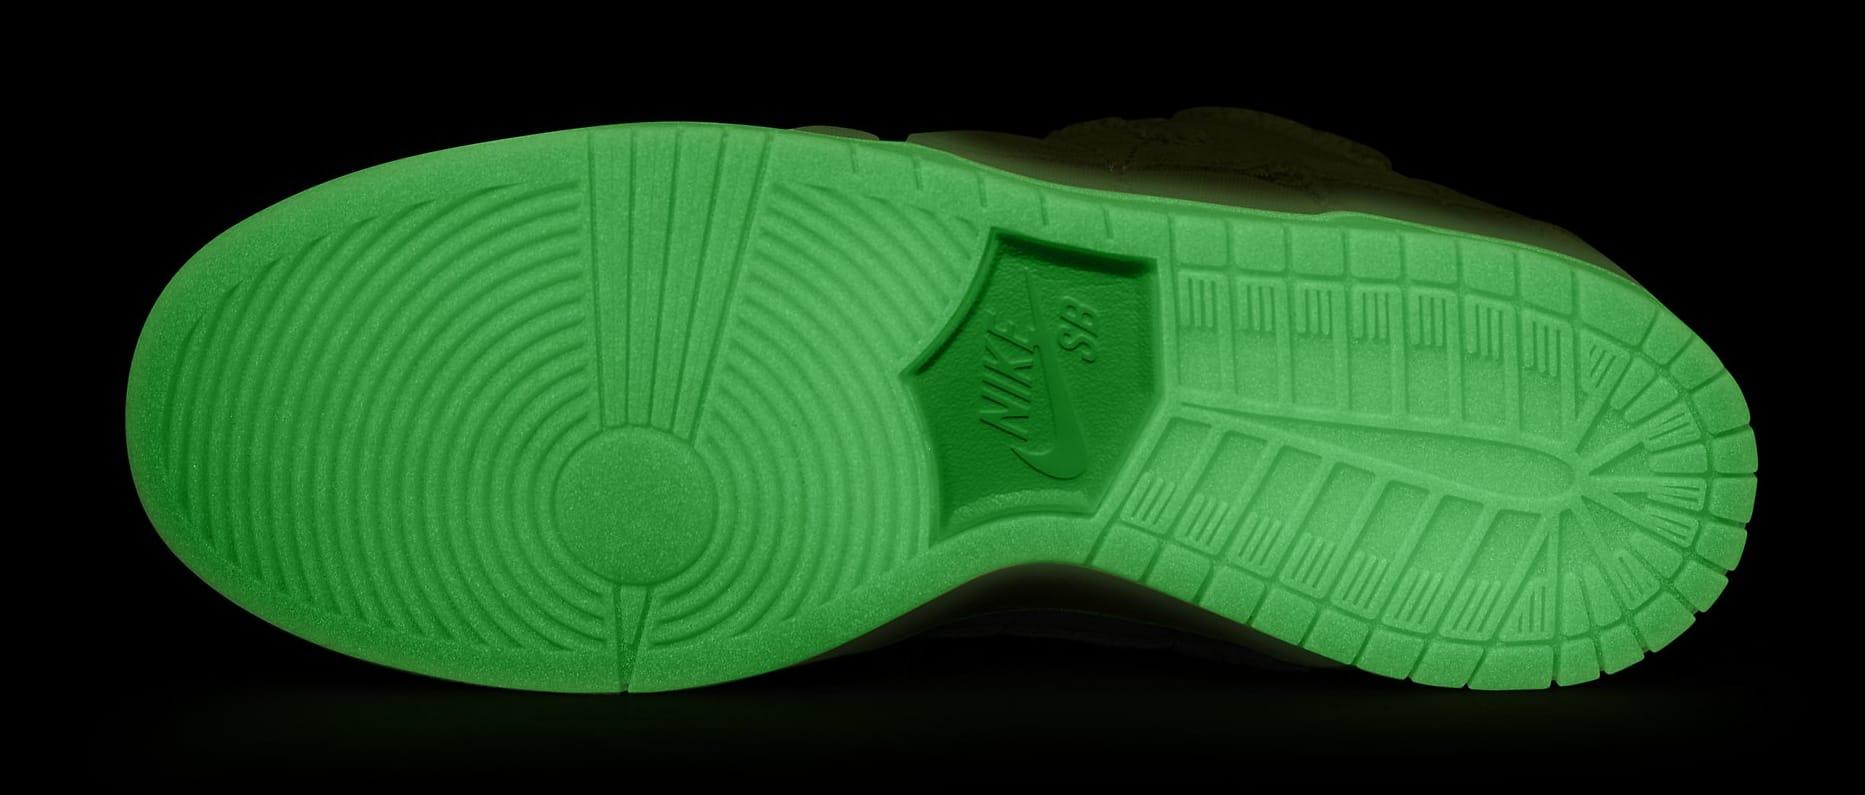 Nike SB Dunk Low 'Mummy' DM0774-111 Outsole